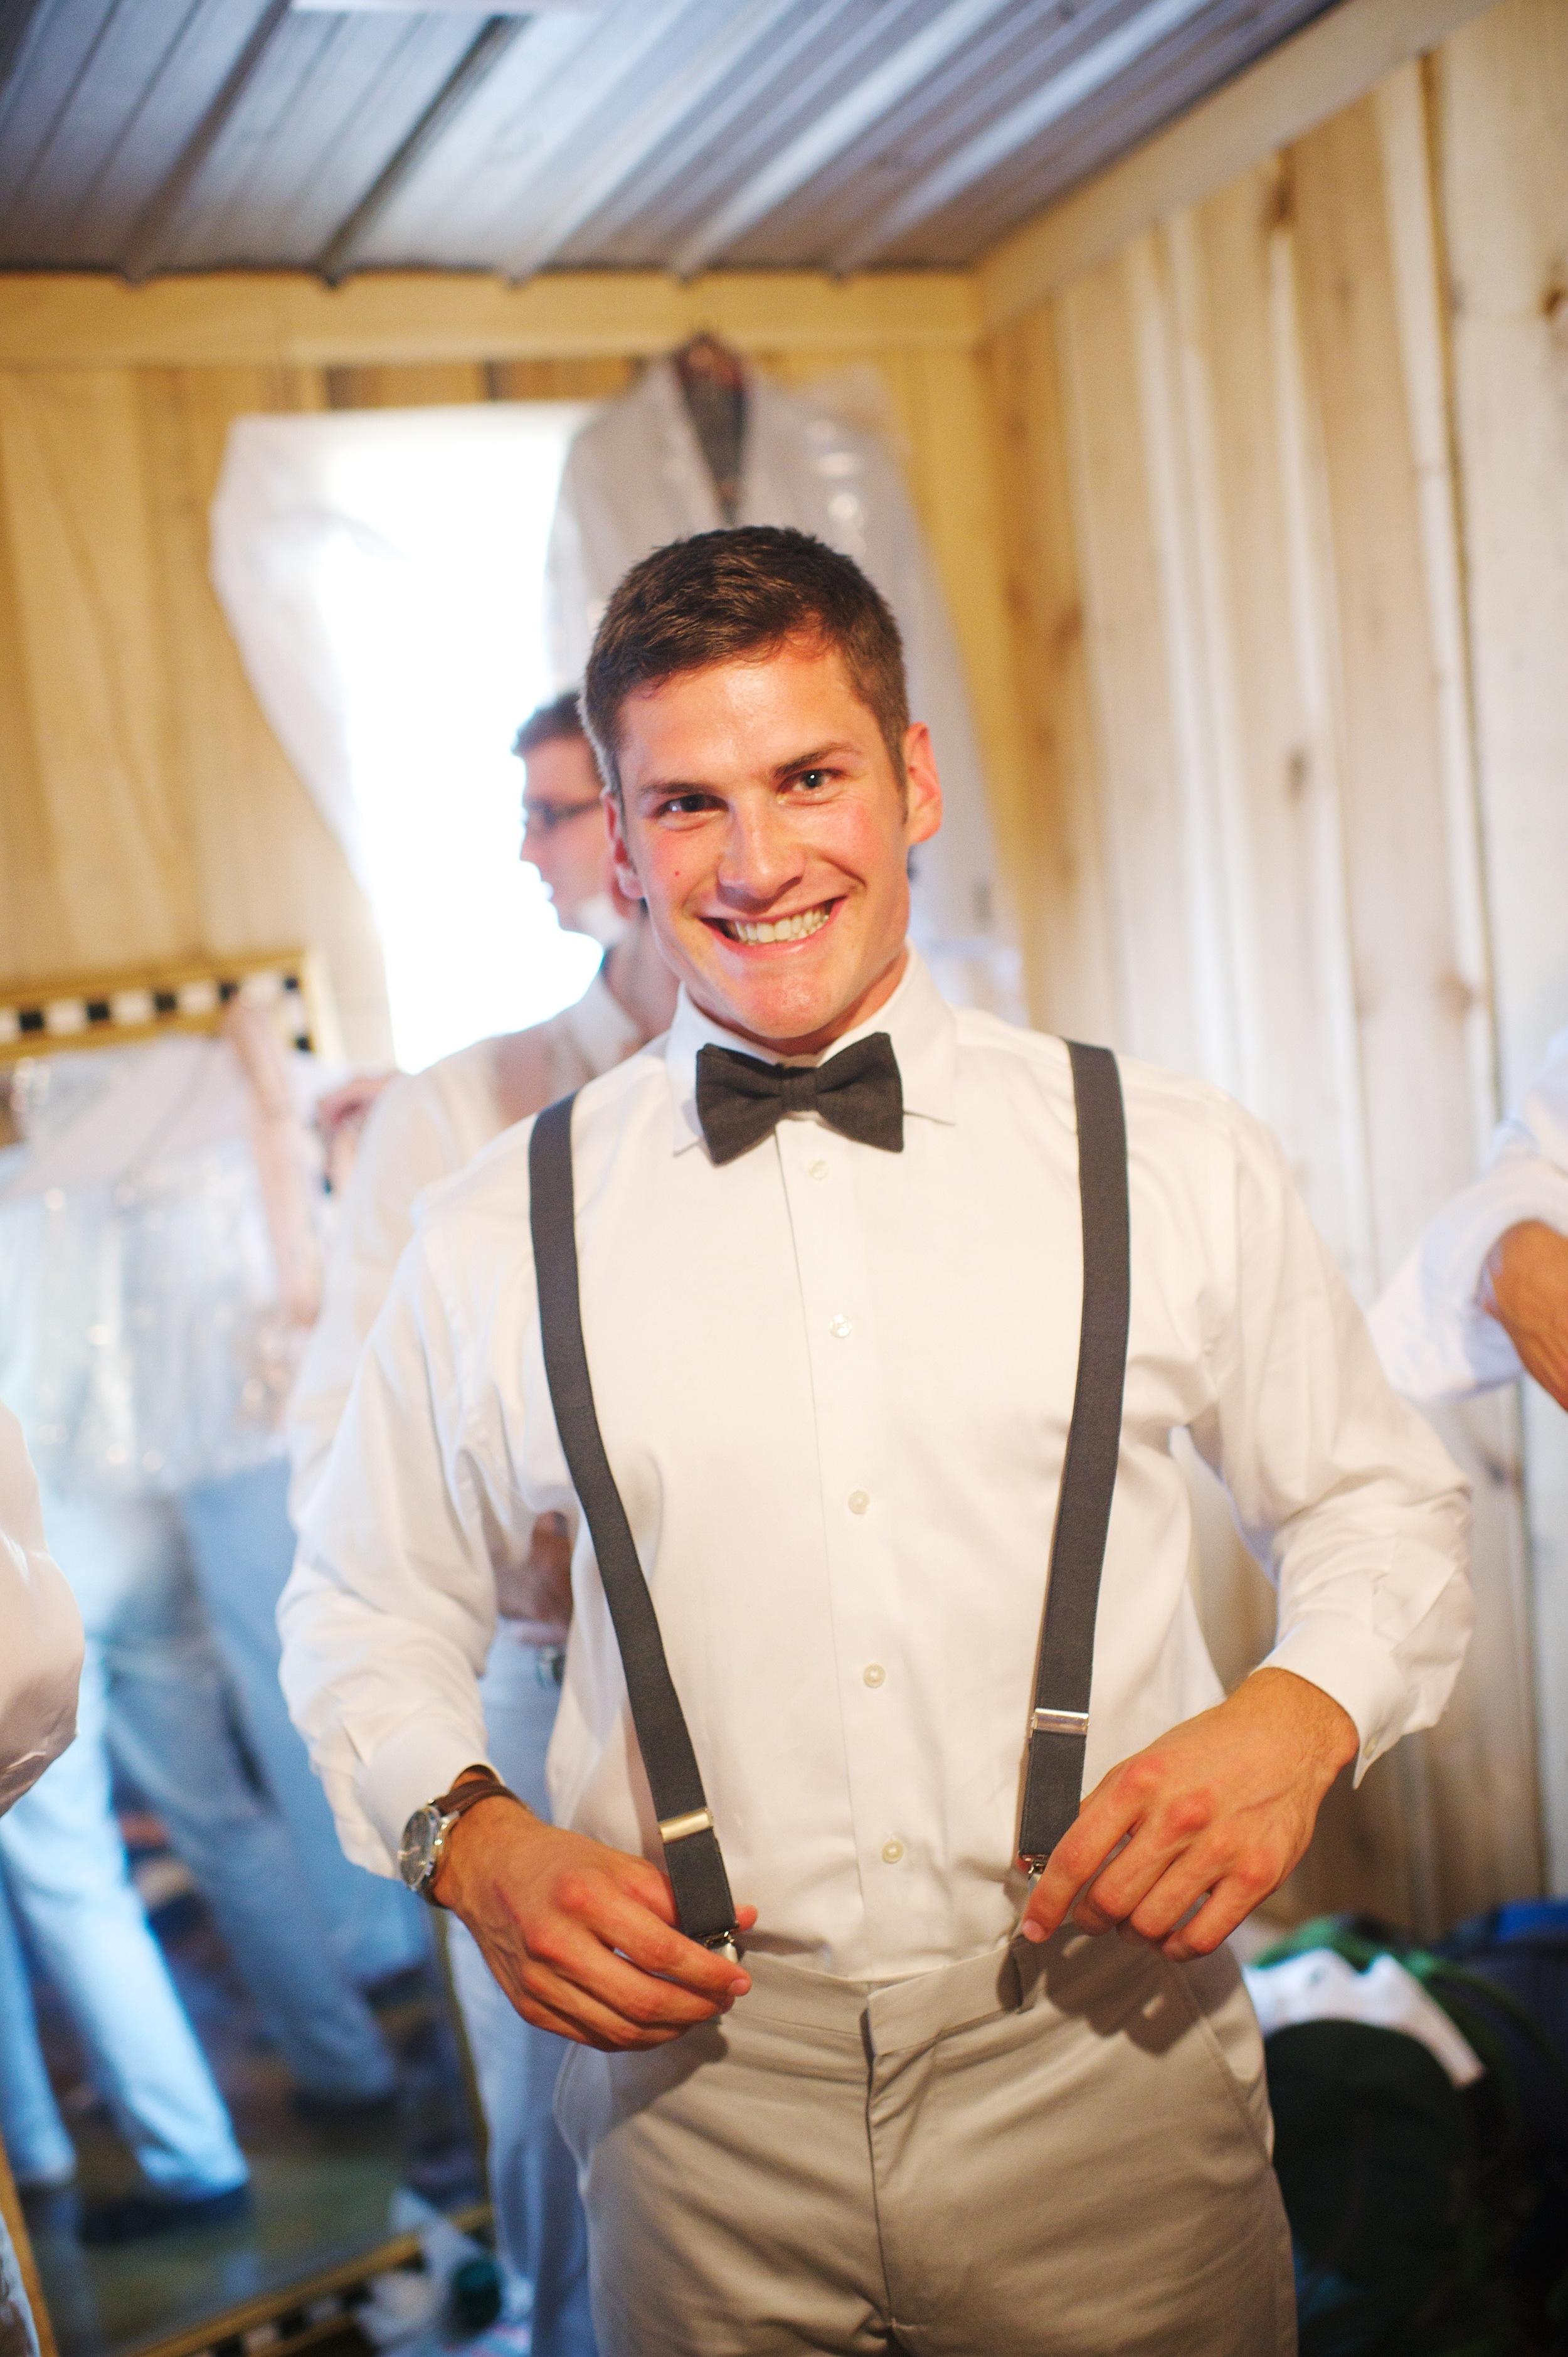 Nashville wedding photographer 18.jpg